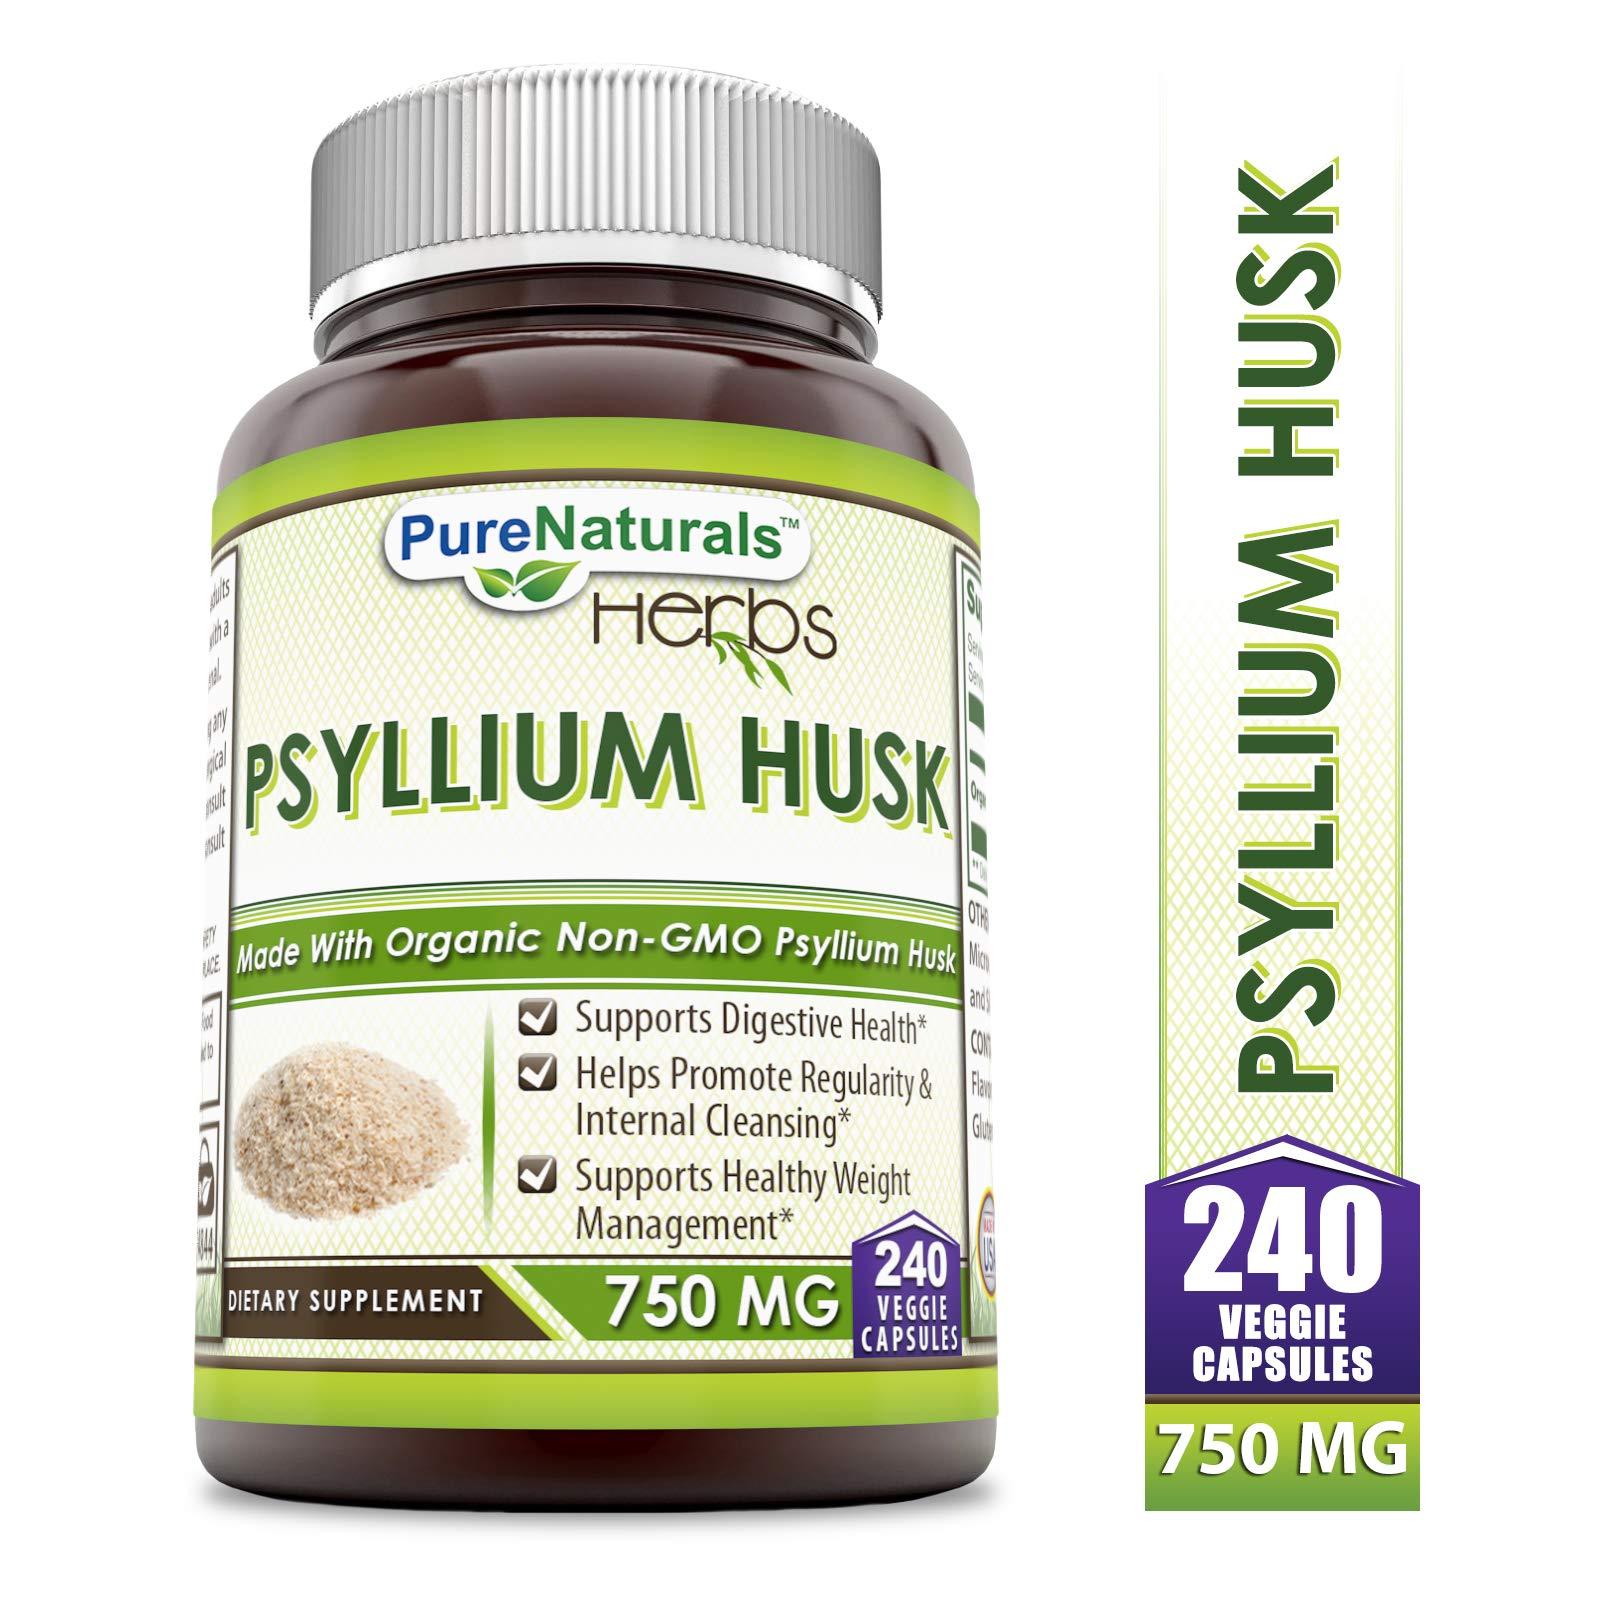 Pure Naturals Psyllium Husk - 750 mg Platango Ovata Fiber Capsules Veggie Capsules (240 Count) by Pure Naturals